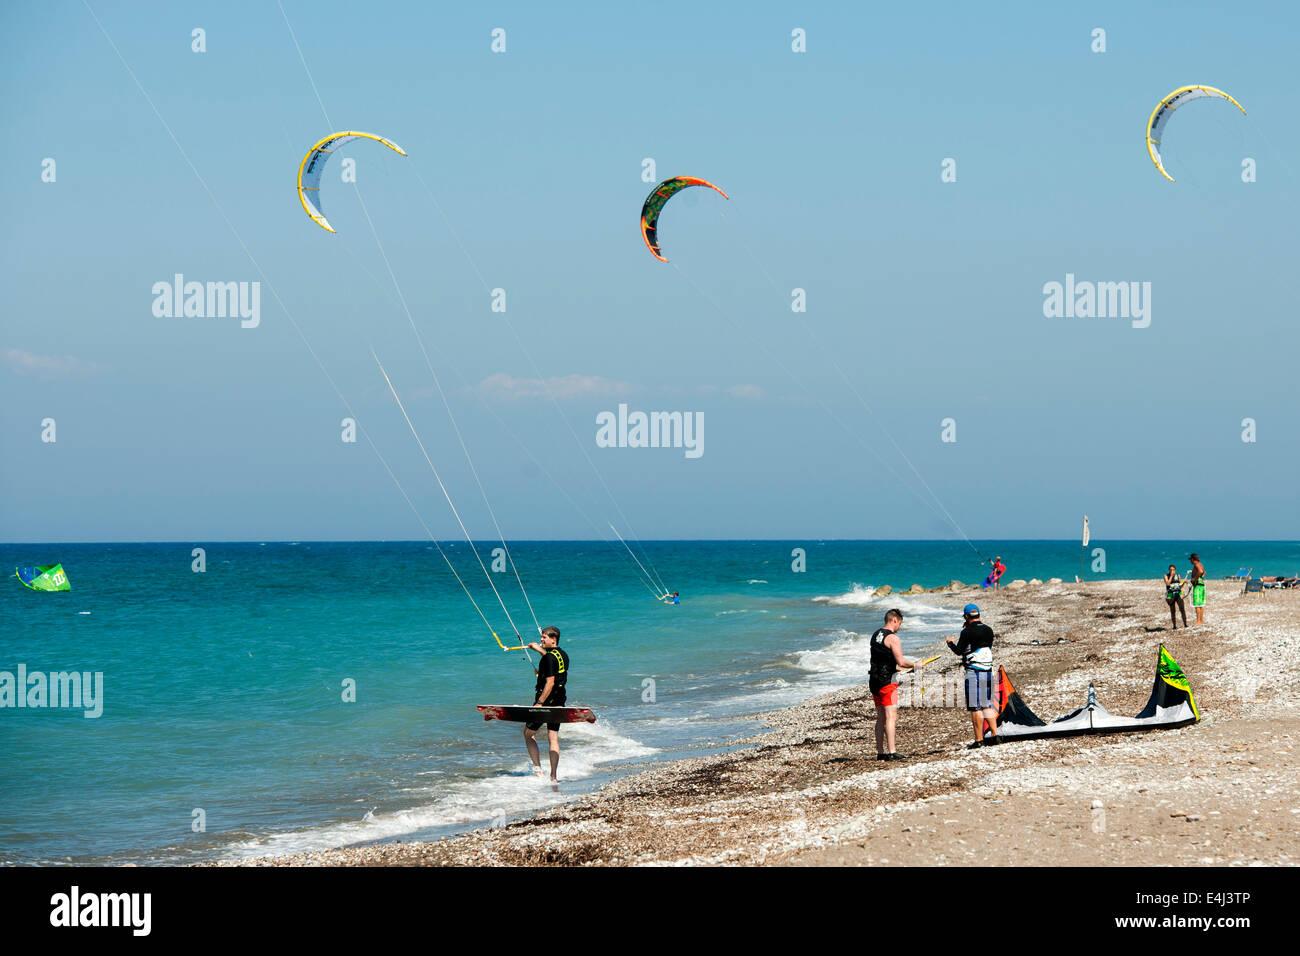 Griechenland, Rhodos, Theologos, Kitesurfer am Strand - Stock Image